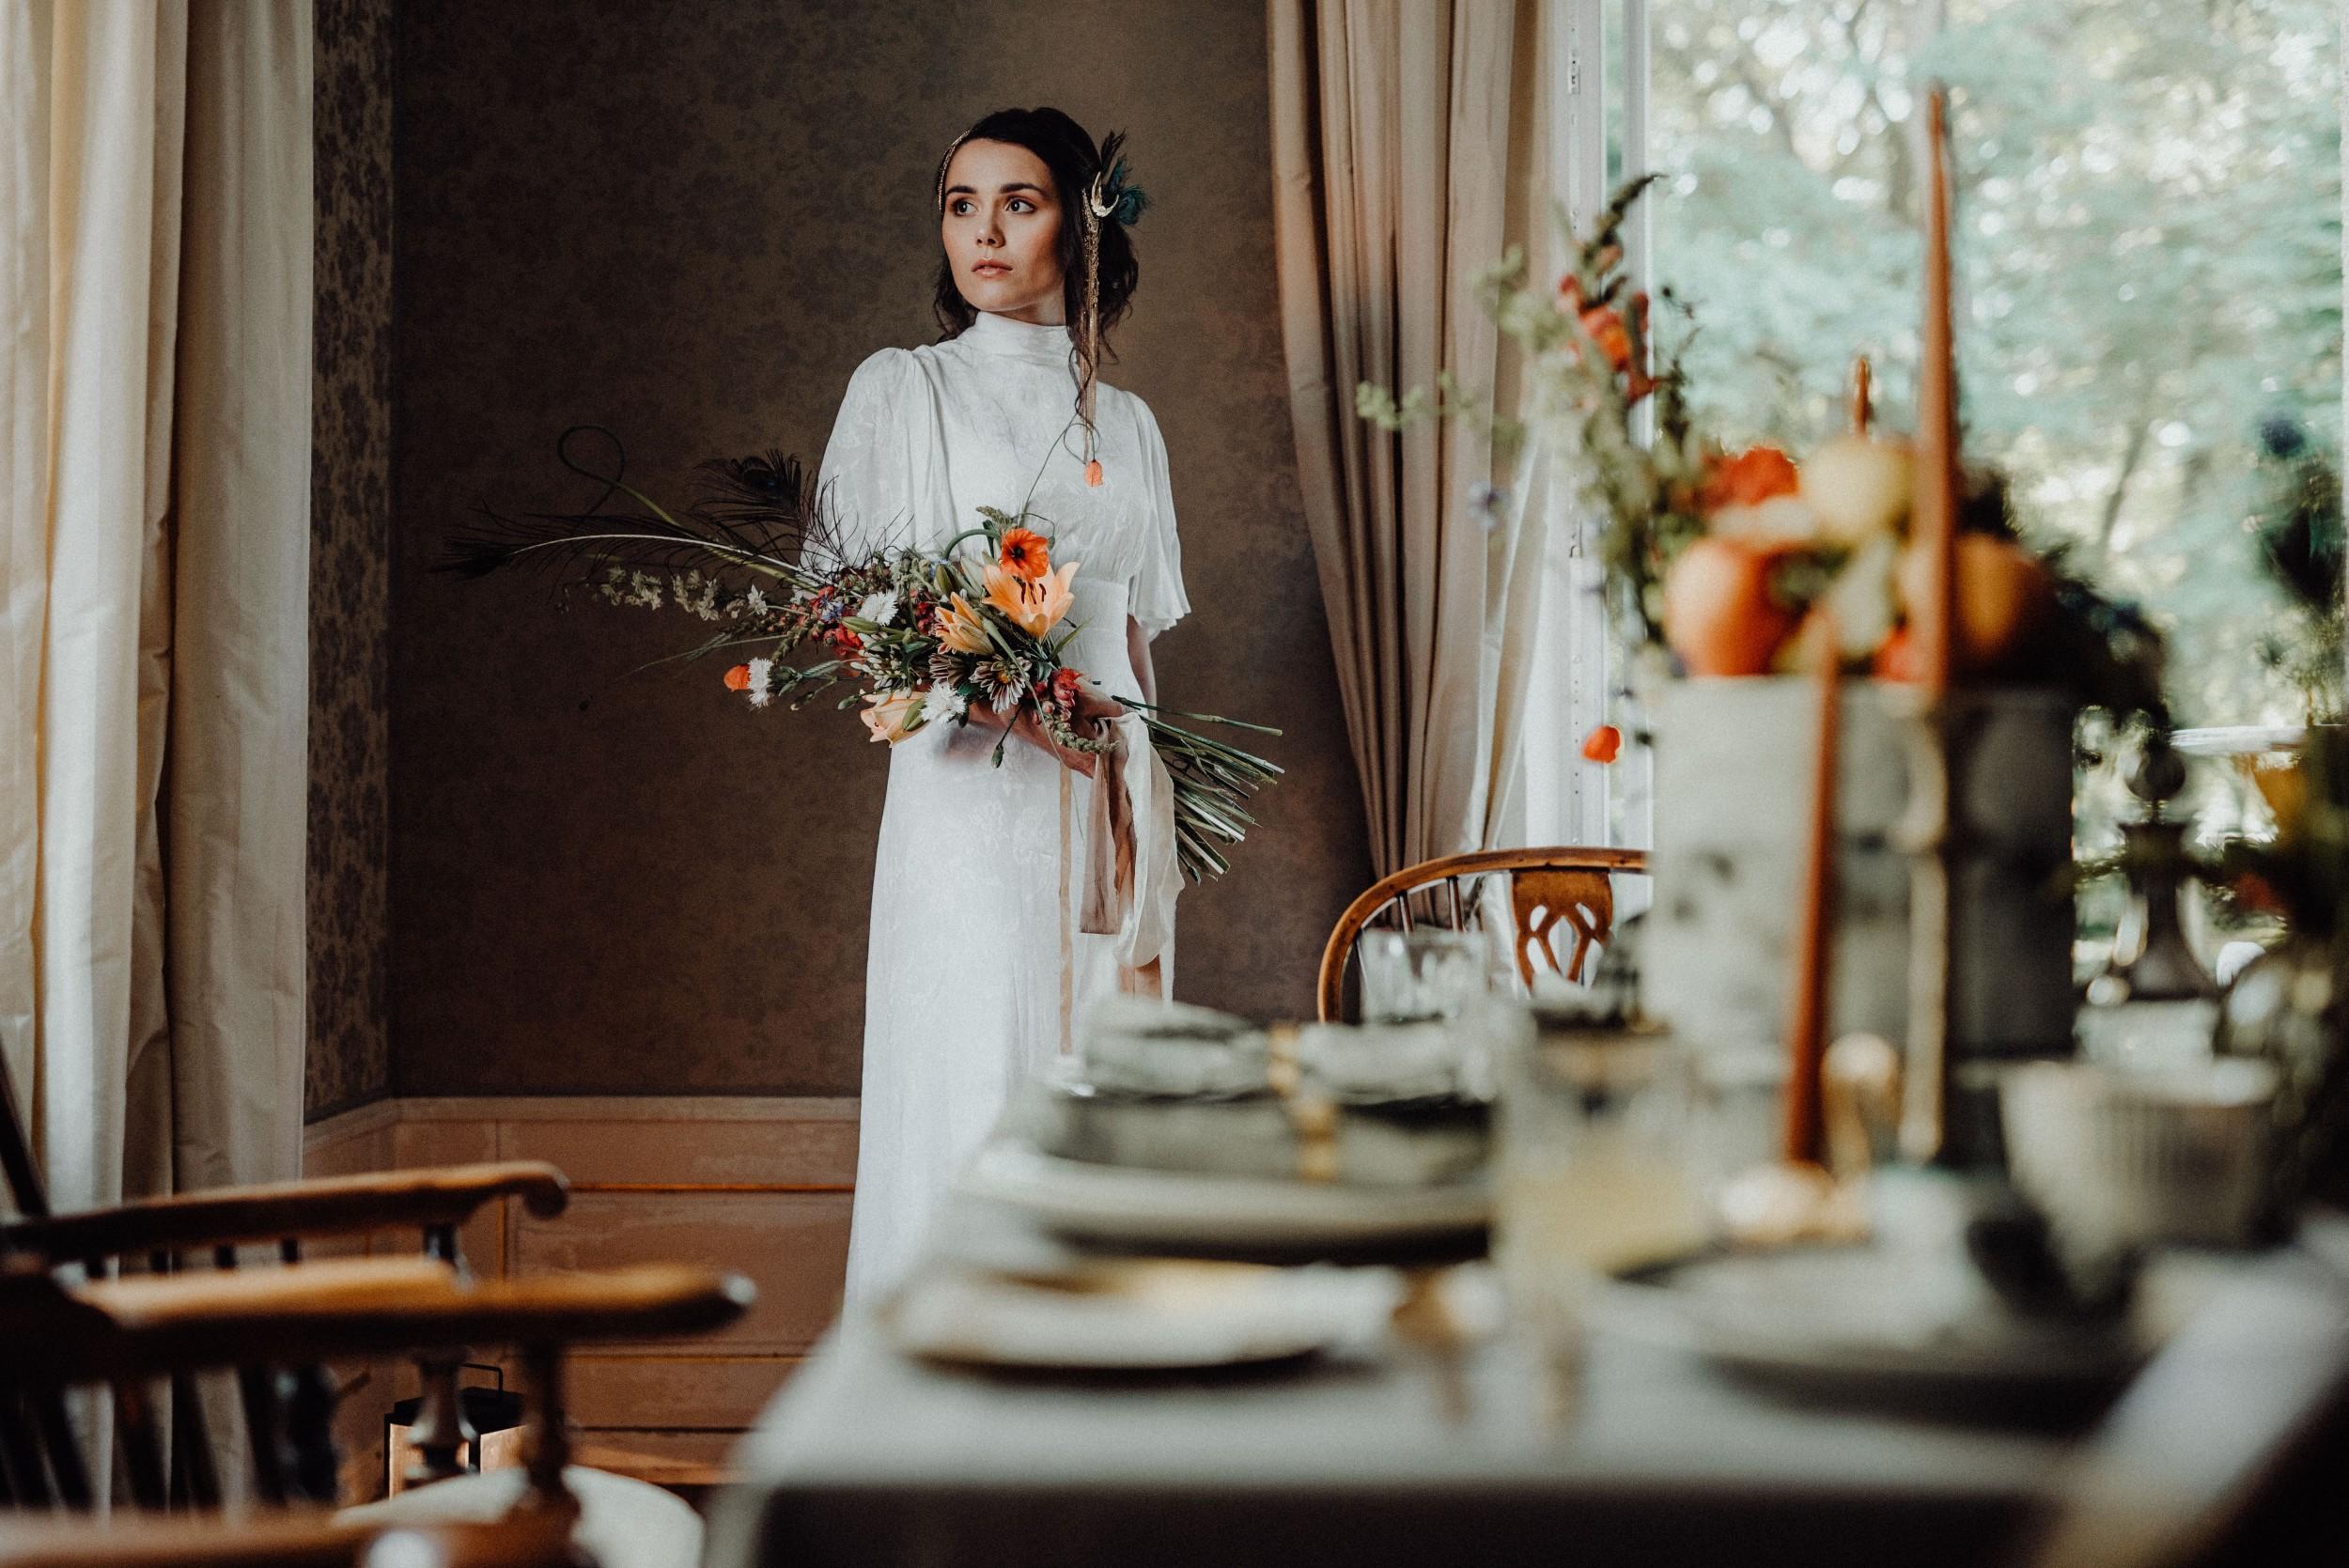 Hochzeitsfotograf Osnabruck Bridal Shoot Im Jugendstil